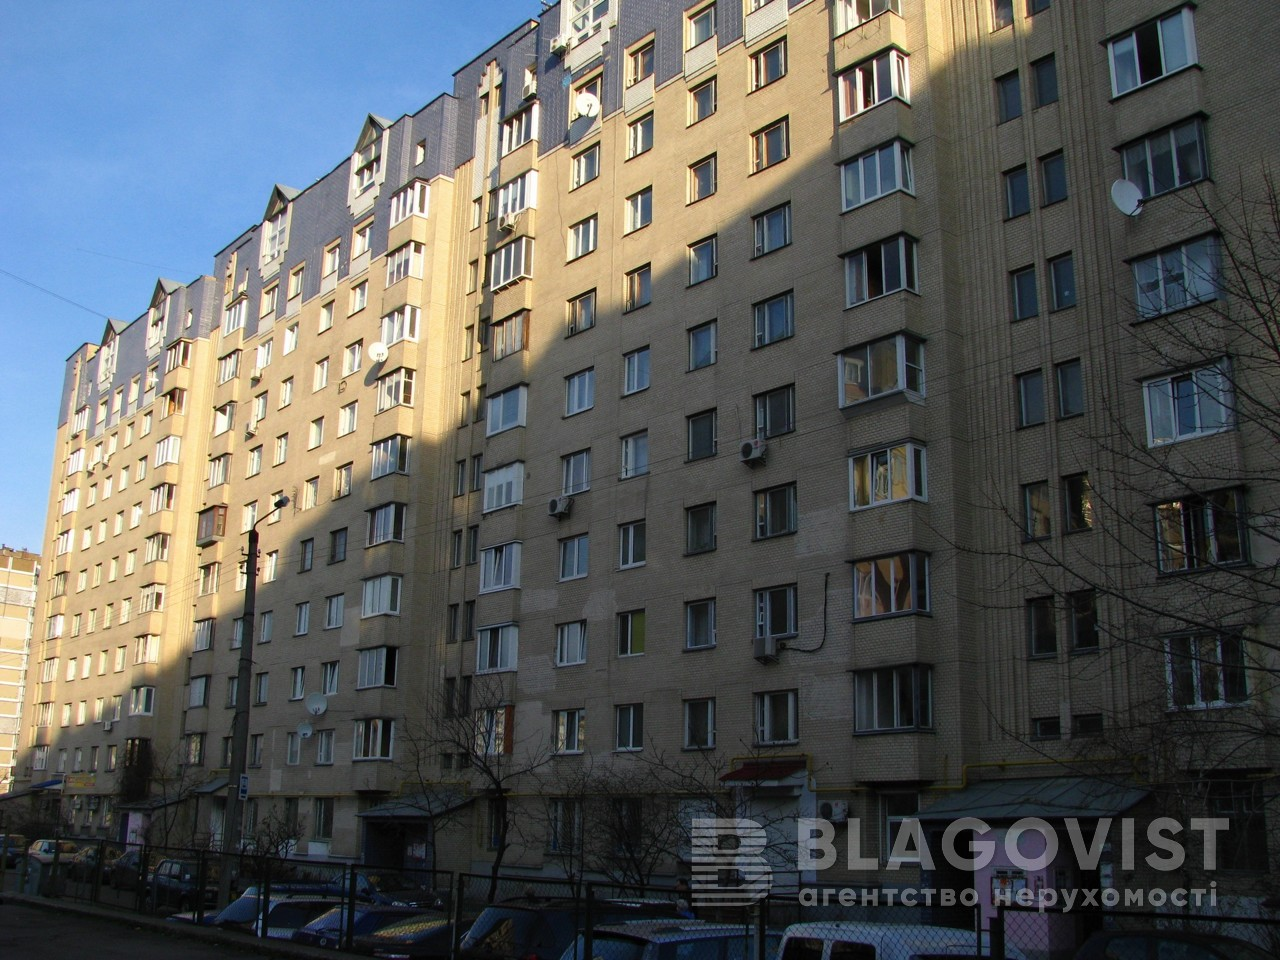 Нежитлове приміщення, P-17282, Ахматової Анни, Київ - Фото 4